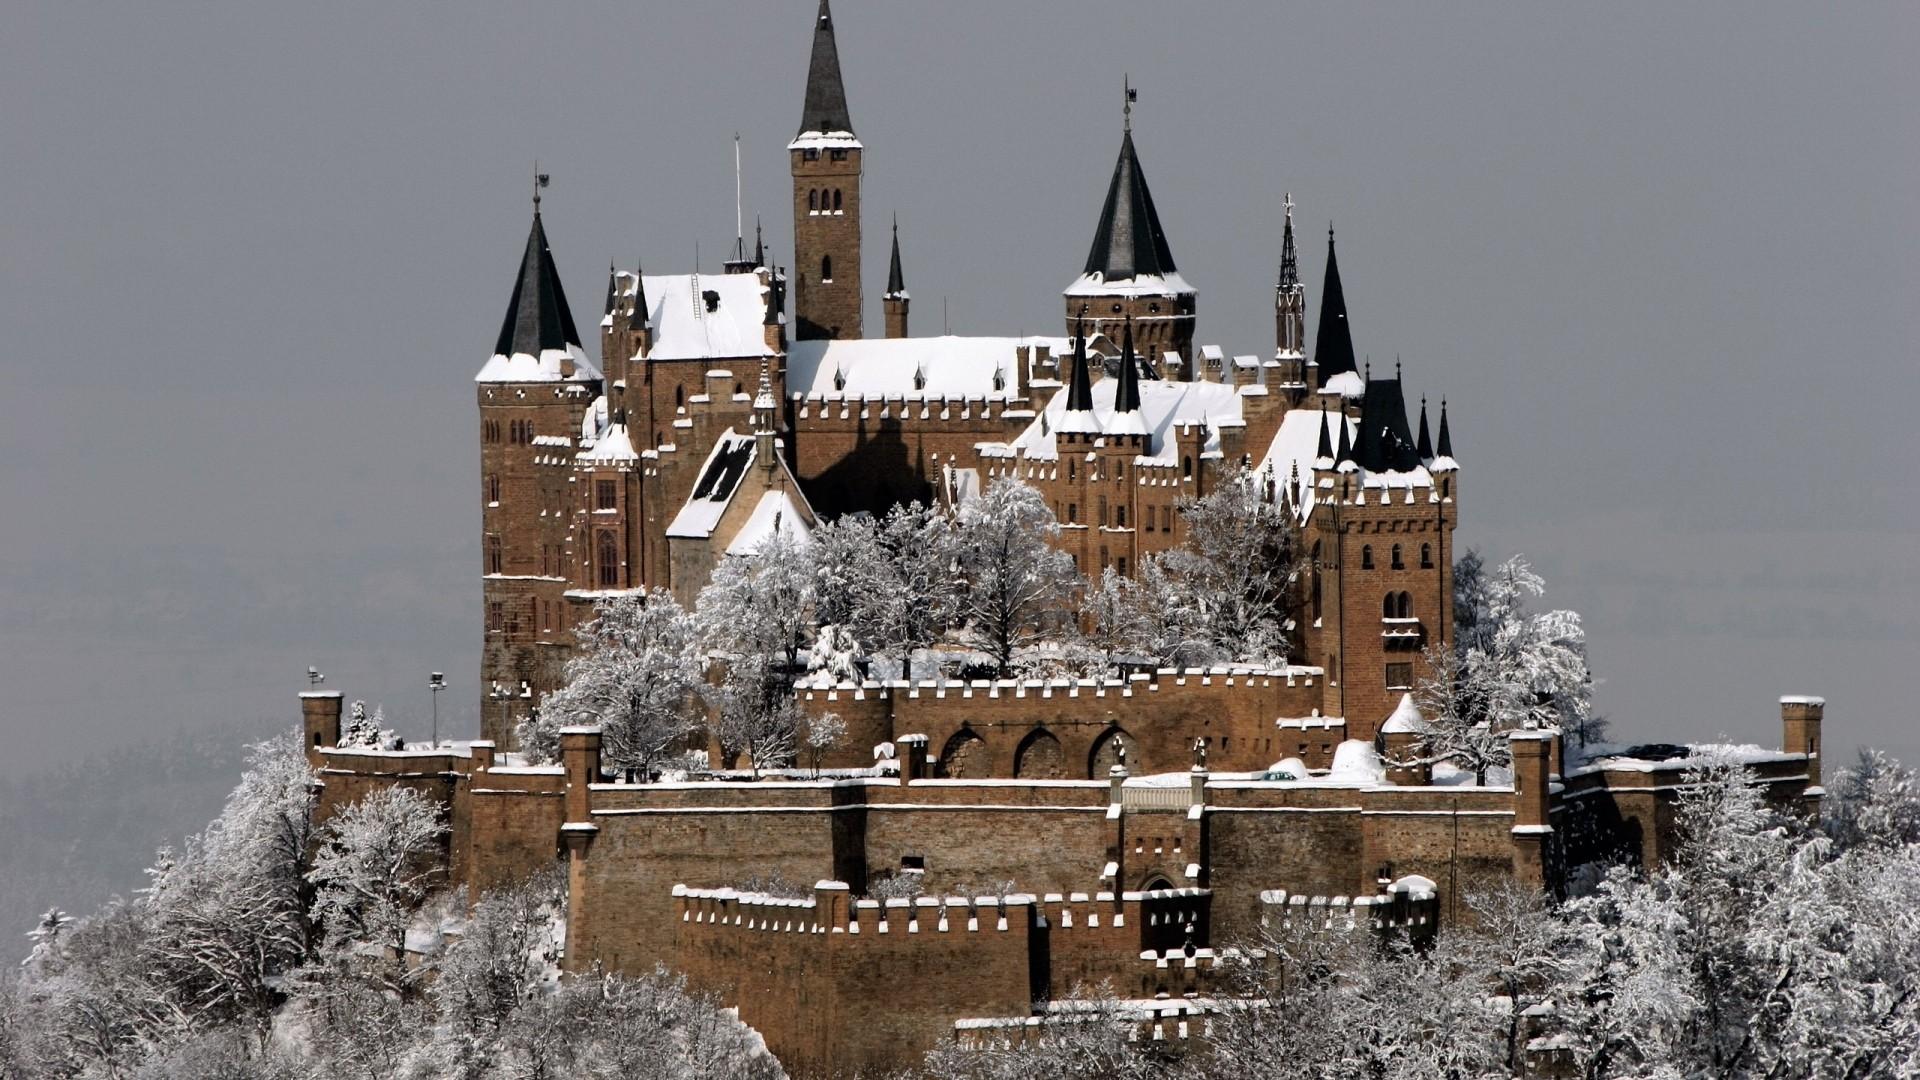 Castle Wallpaper for pc